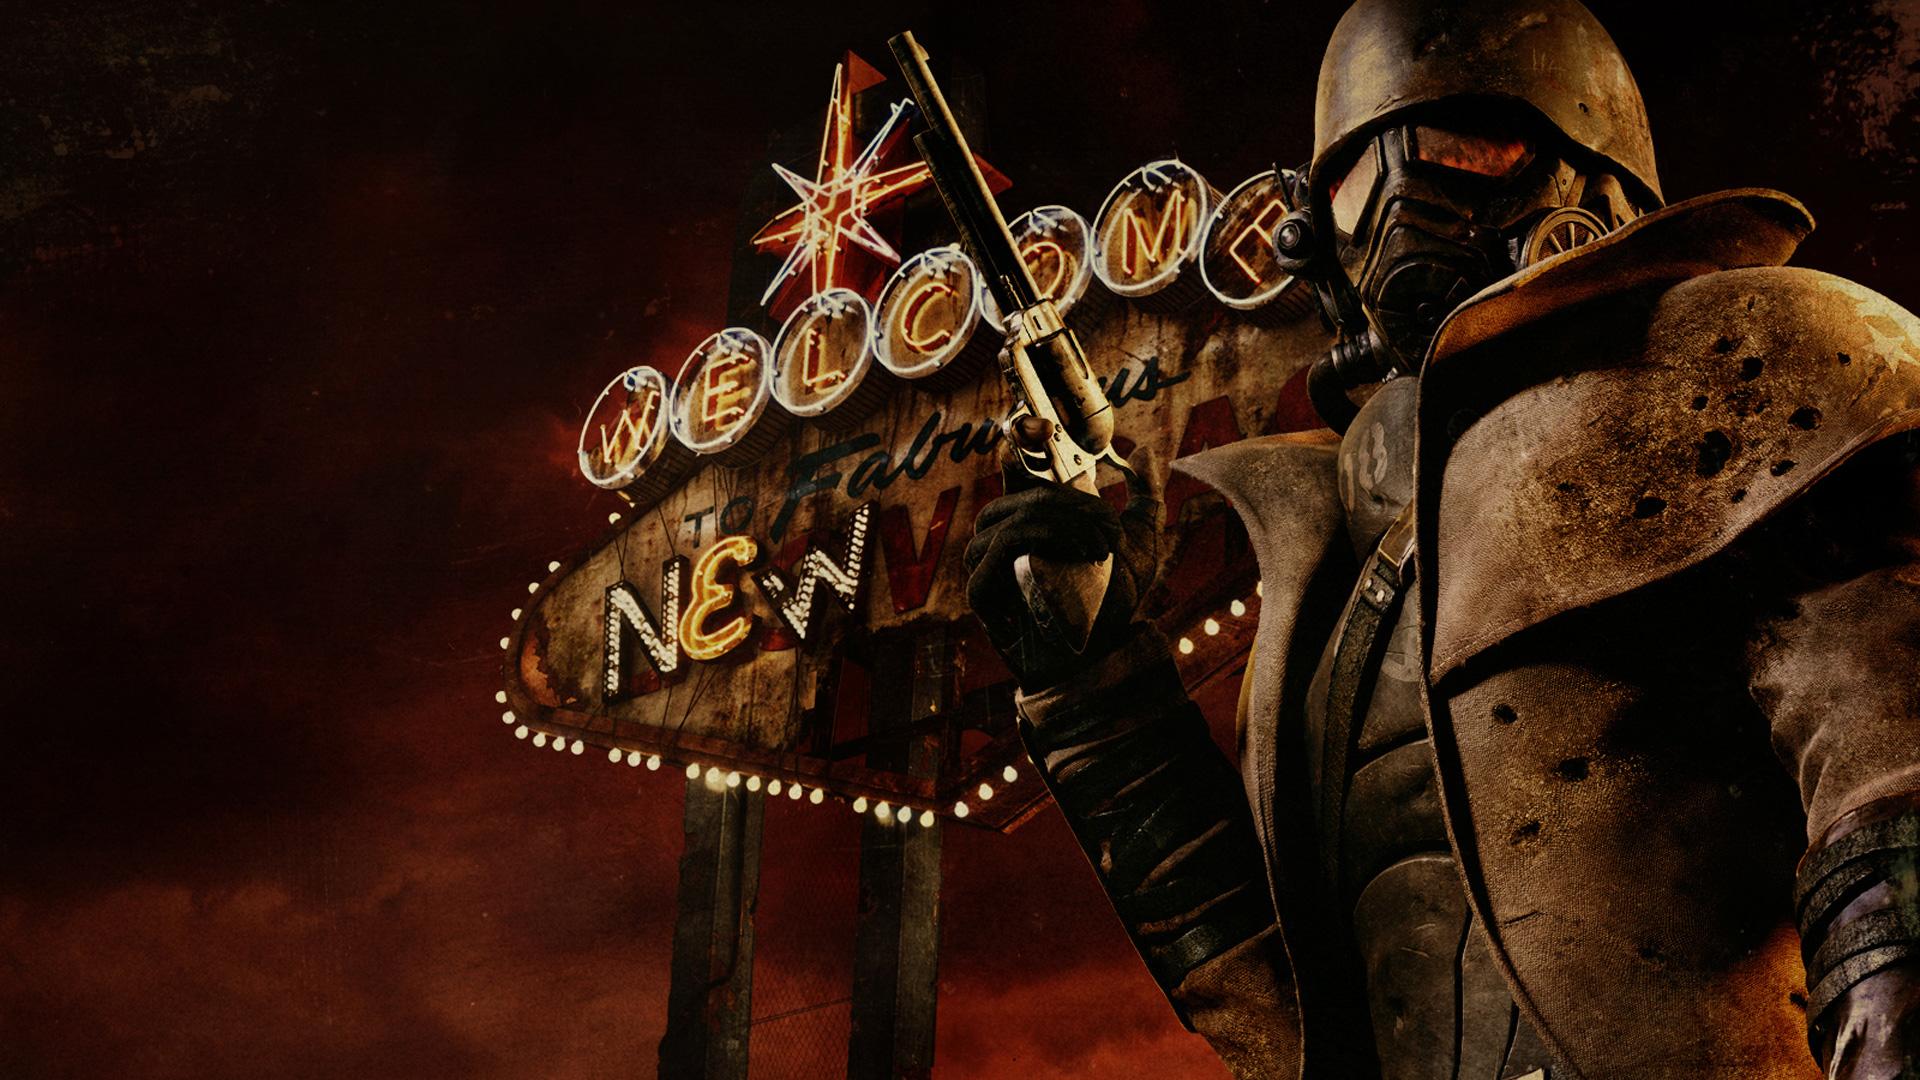 Fallout New Vegas Wallpaper in 1920x1080 1920x1080